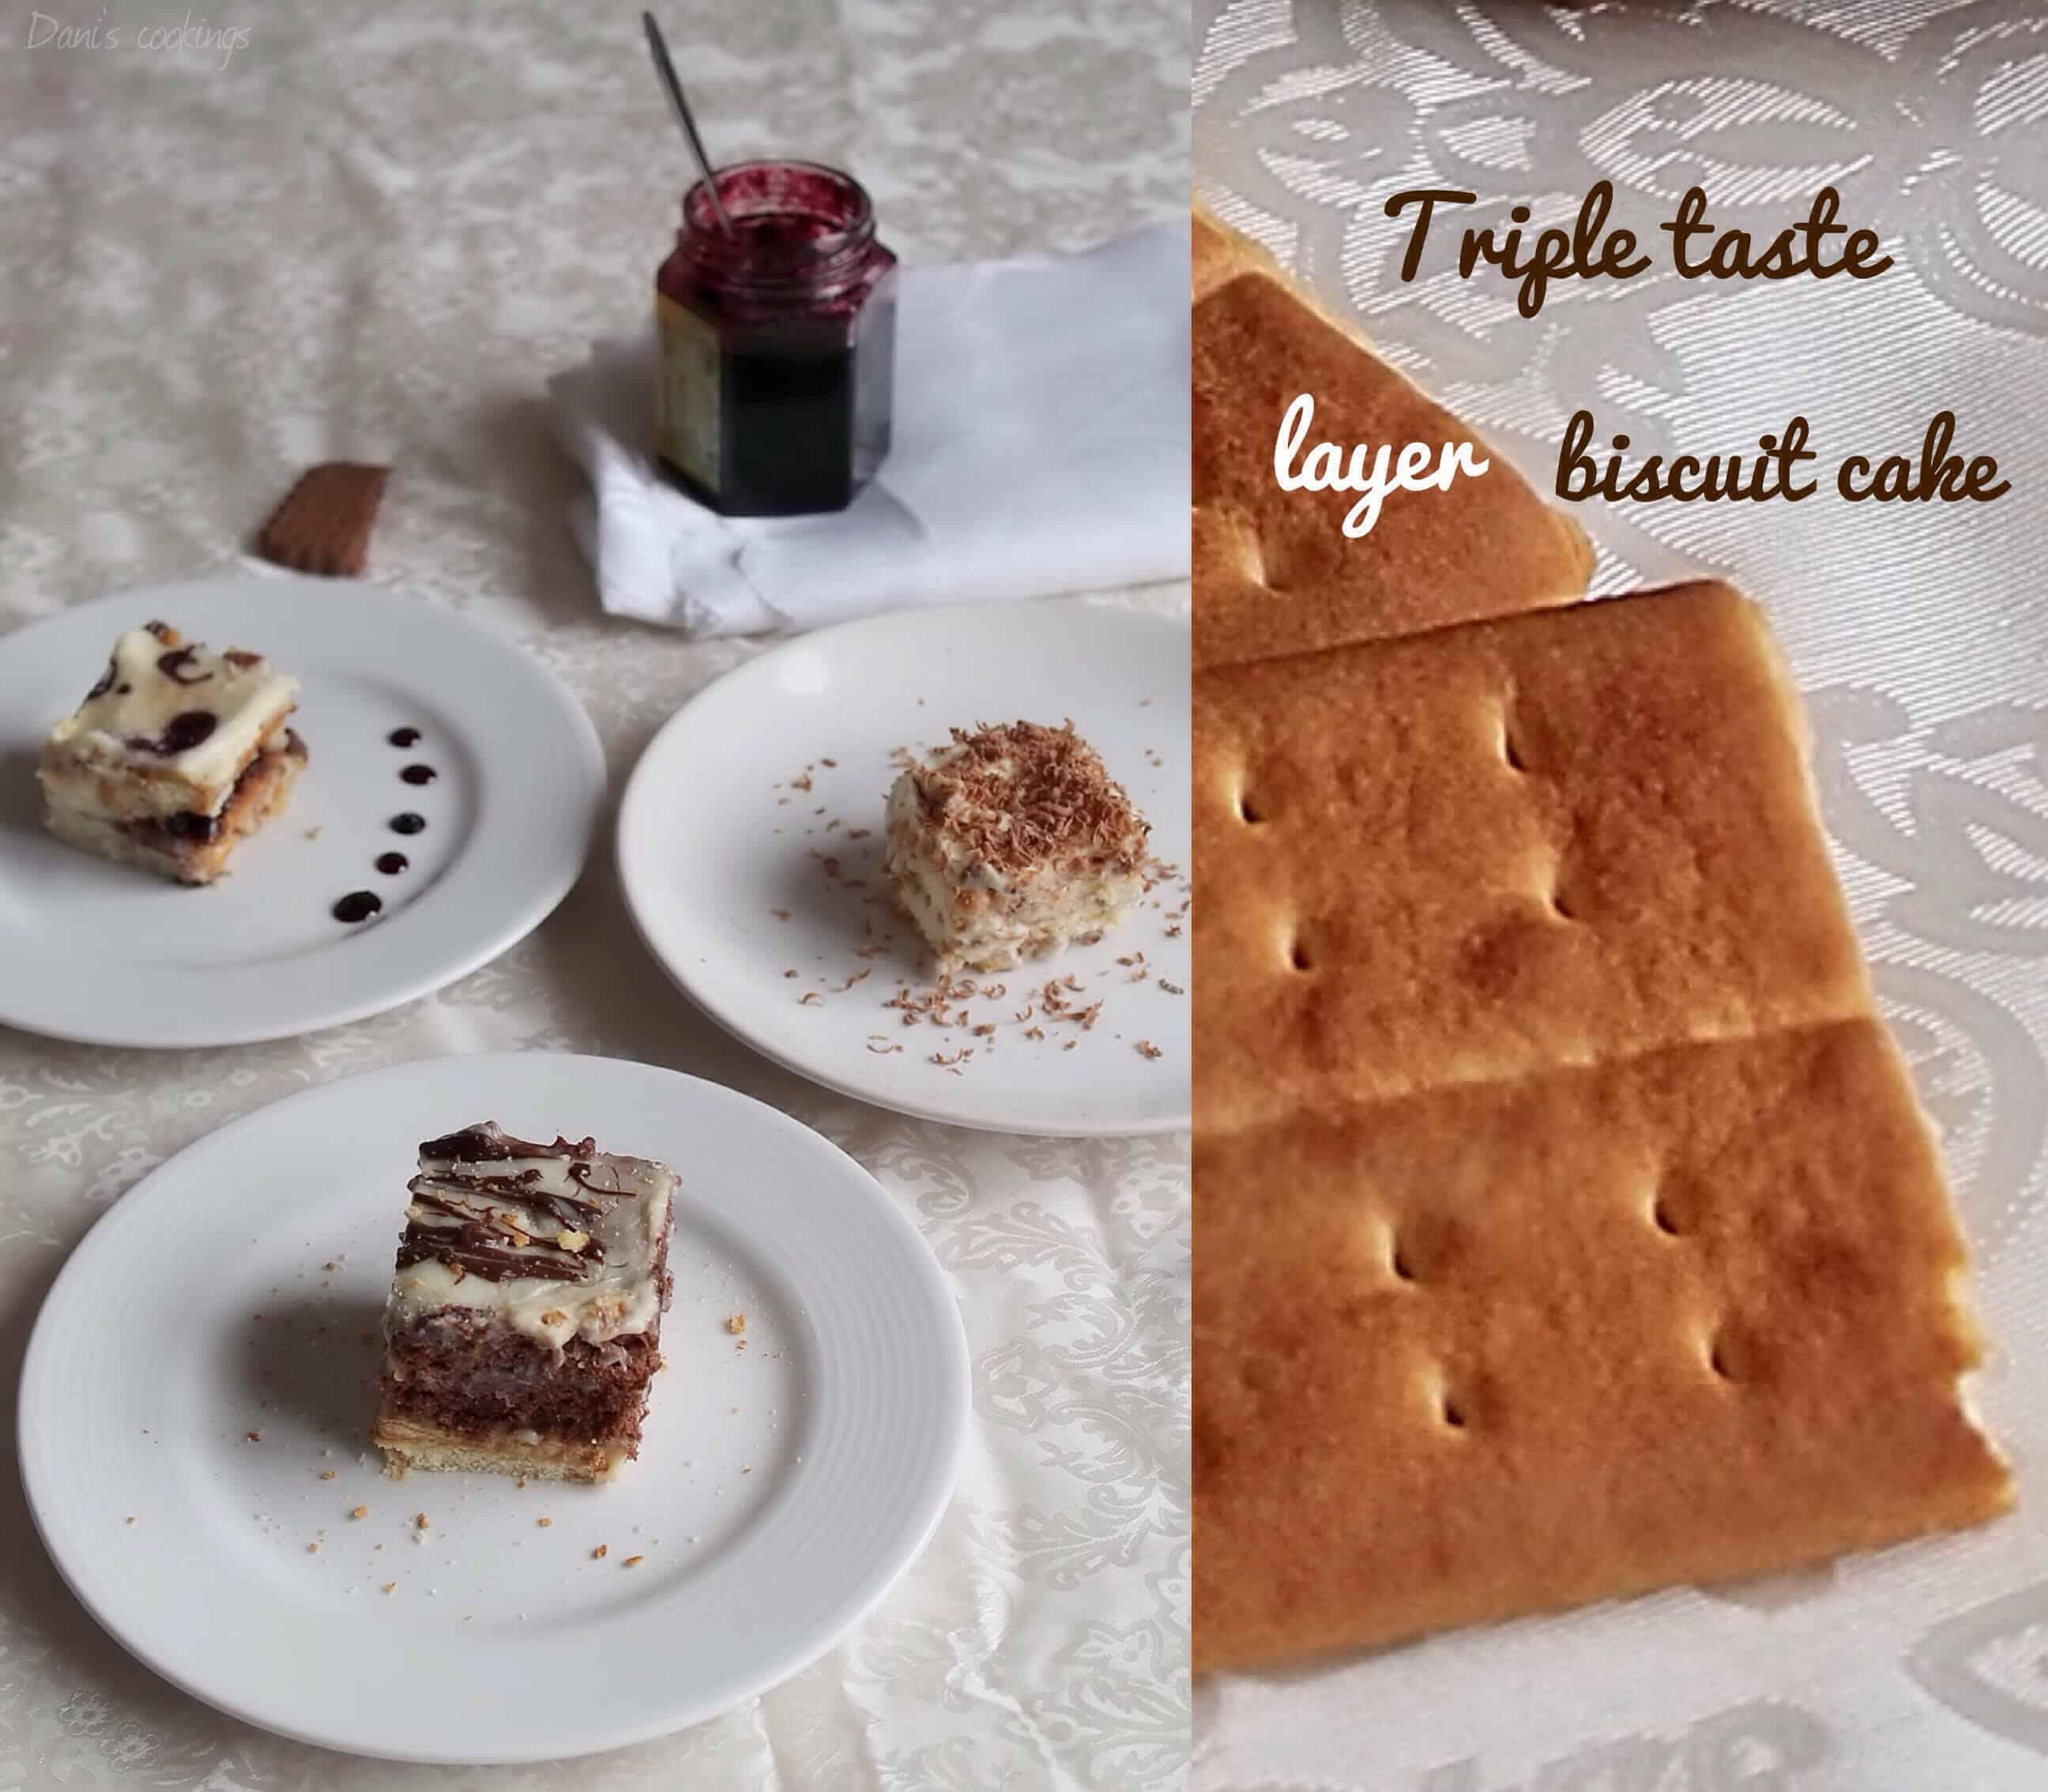 Triple taste layer biscuit cake - daniscookings.wordpress.com